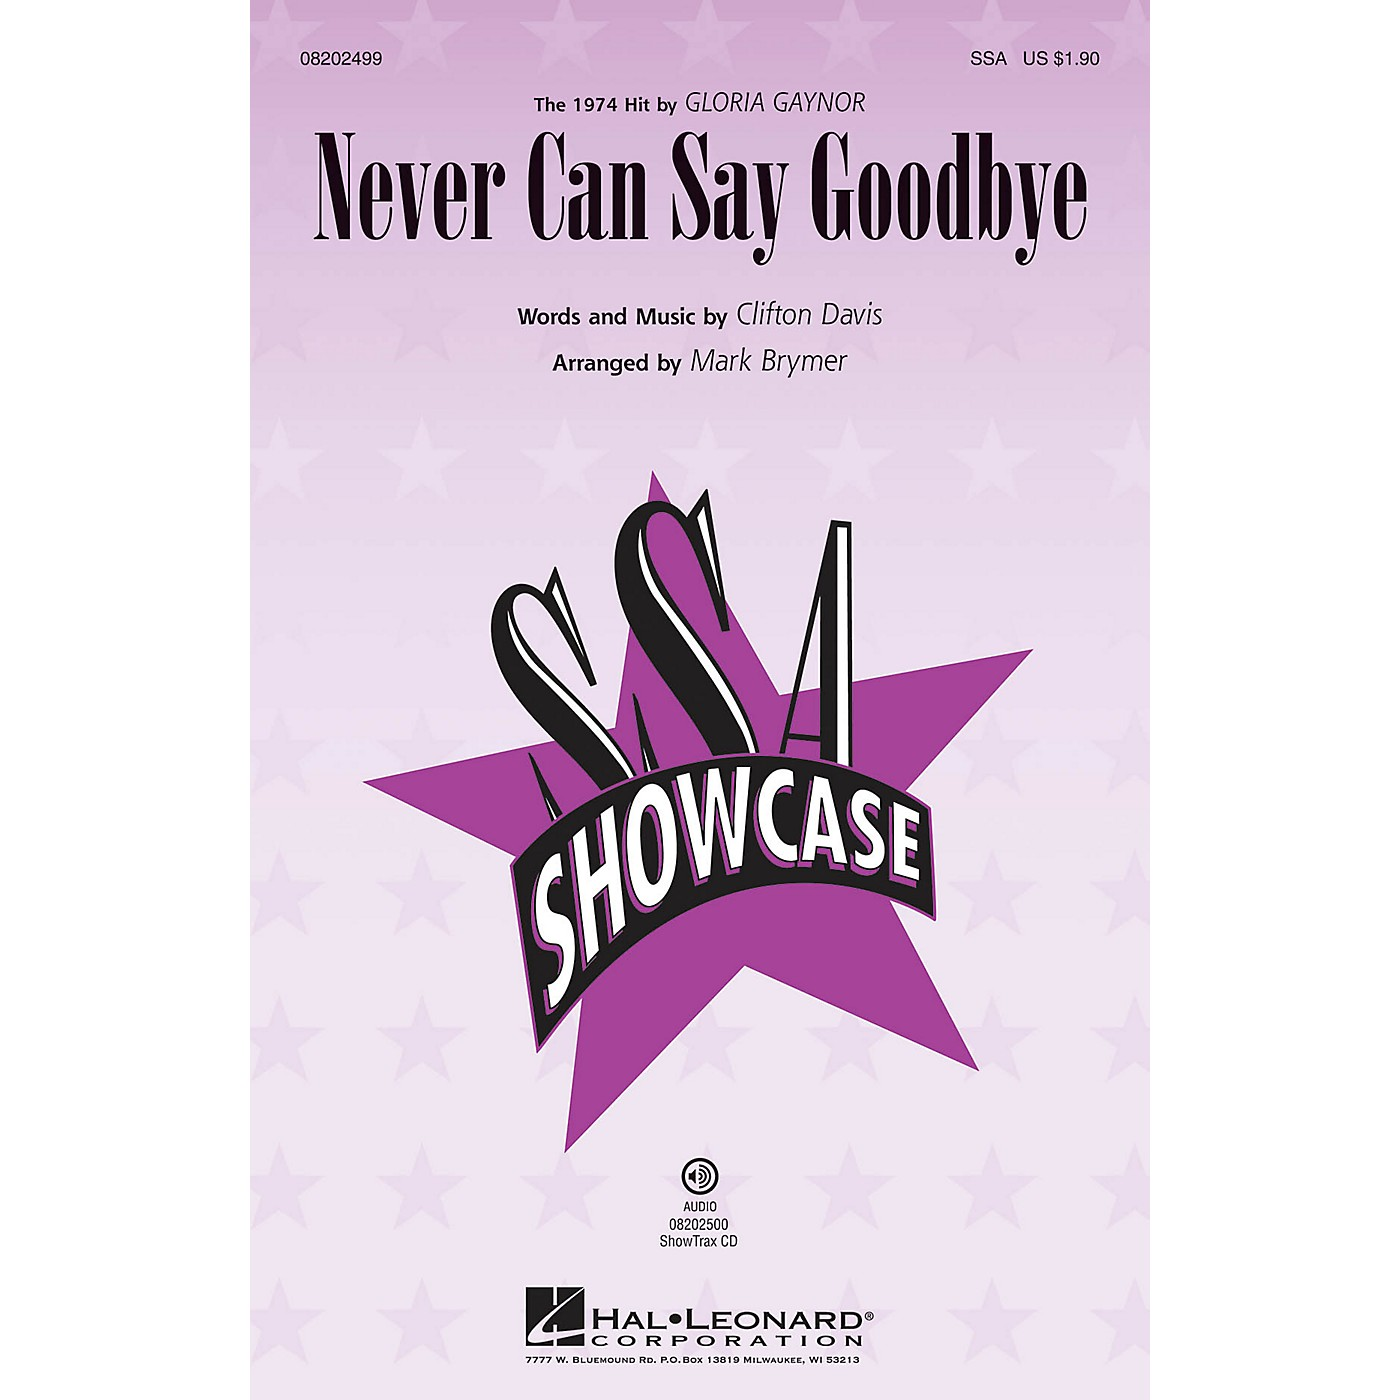 Hal Leonard Never Can Say Goodbye SSA by Gloria Gaynor arranged by Mark Brymer thumbnail